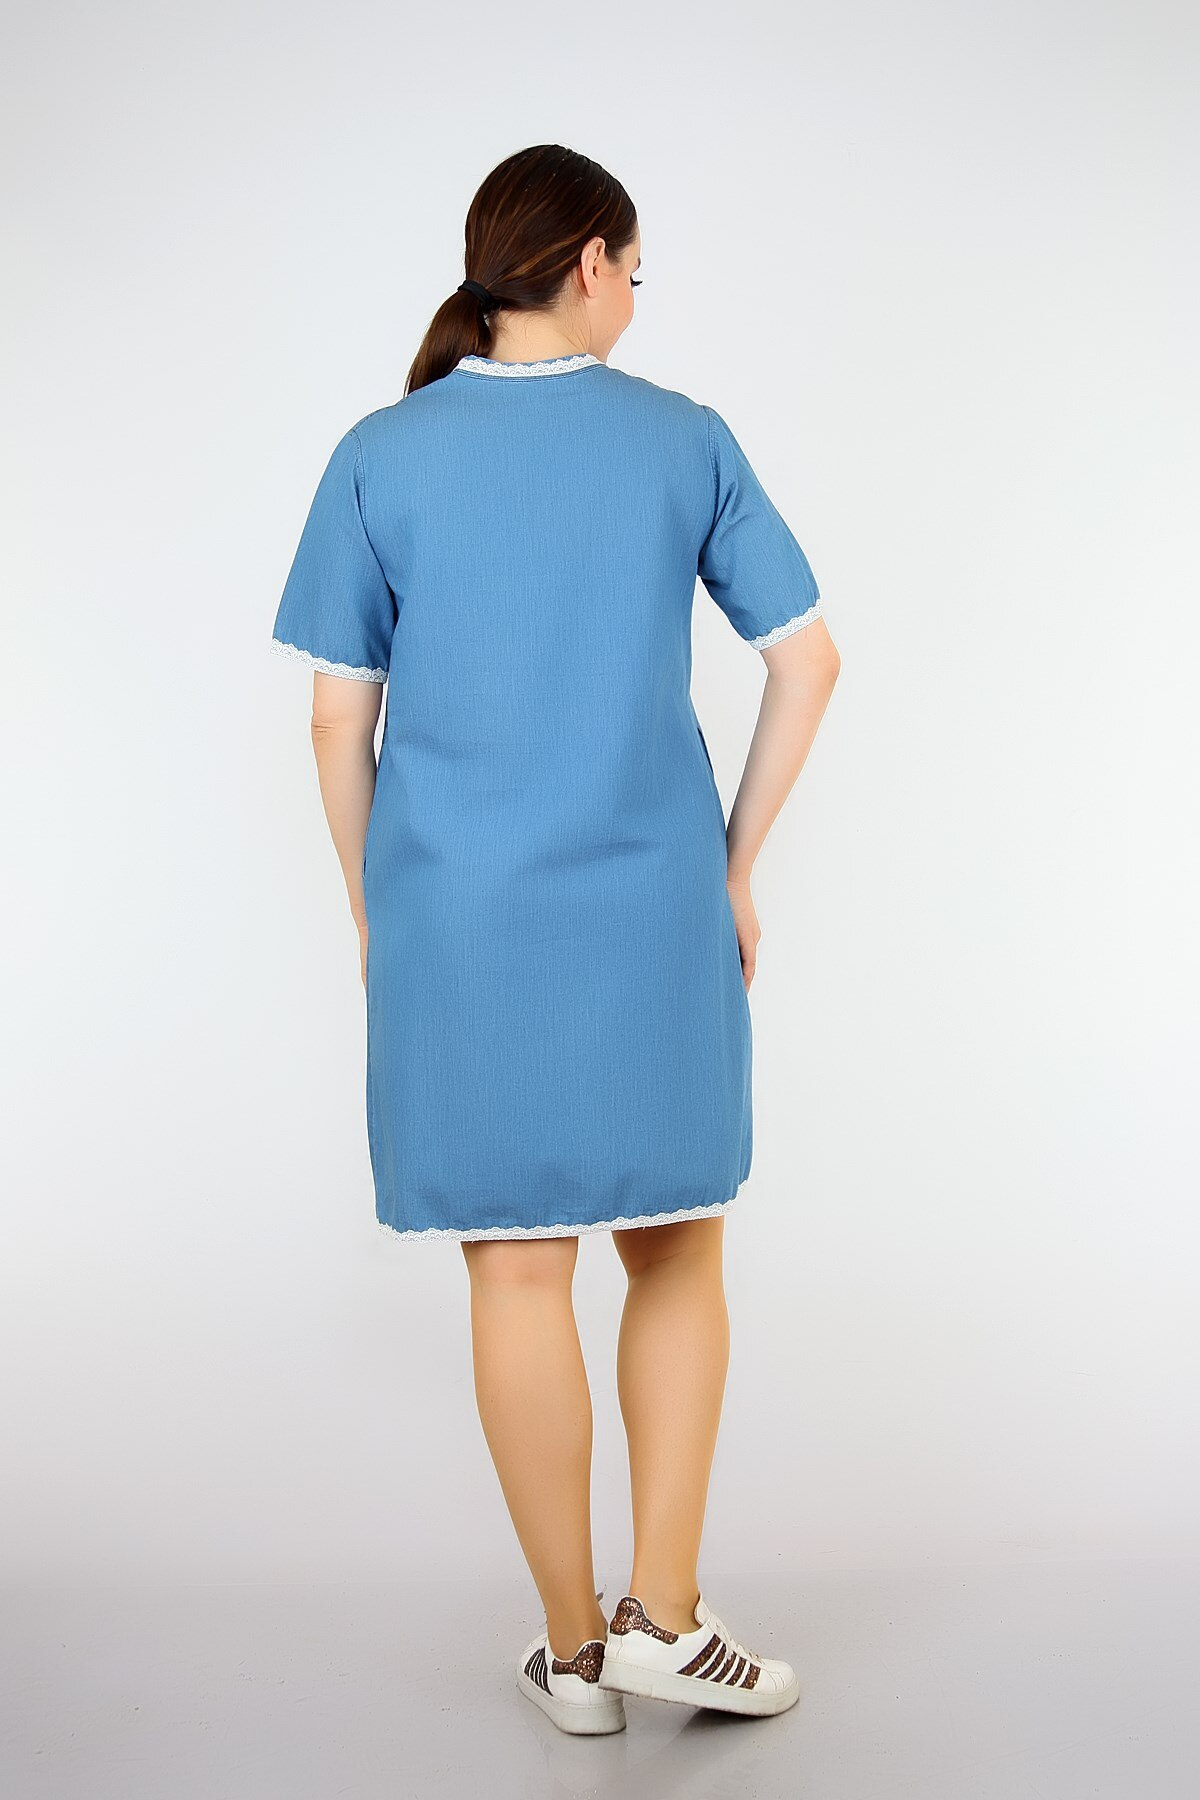 Pianoluce Women 'S Denim Lace Detail Half Sleeve Dress Blue 1387 2